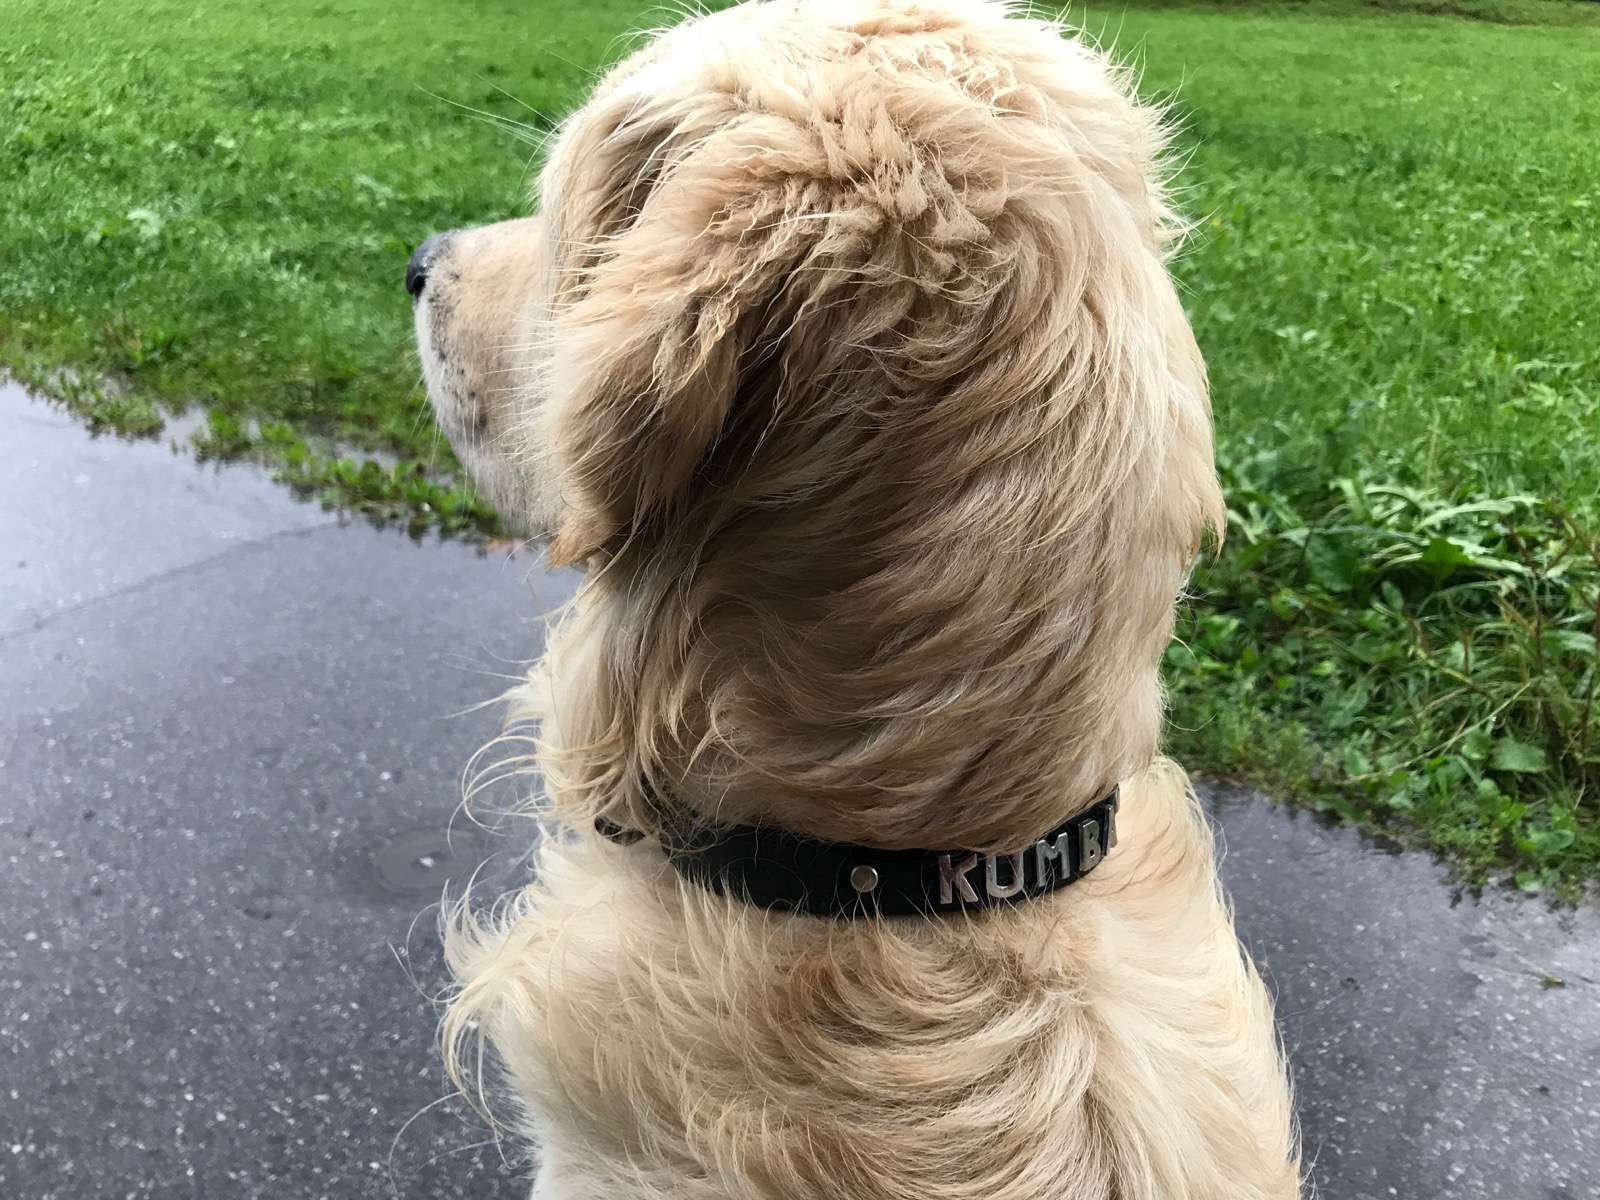 hundehalsband1